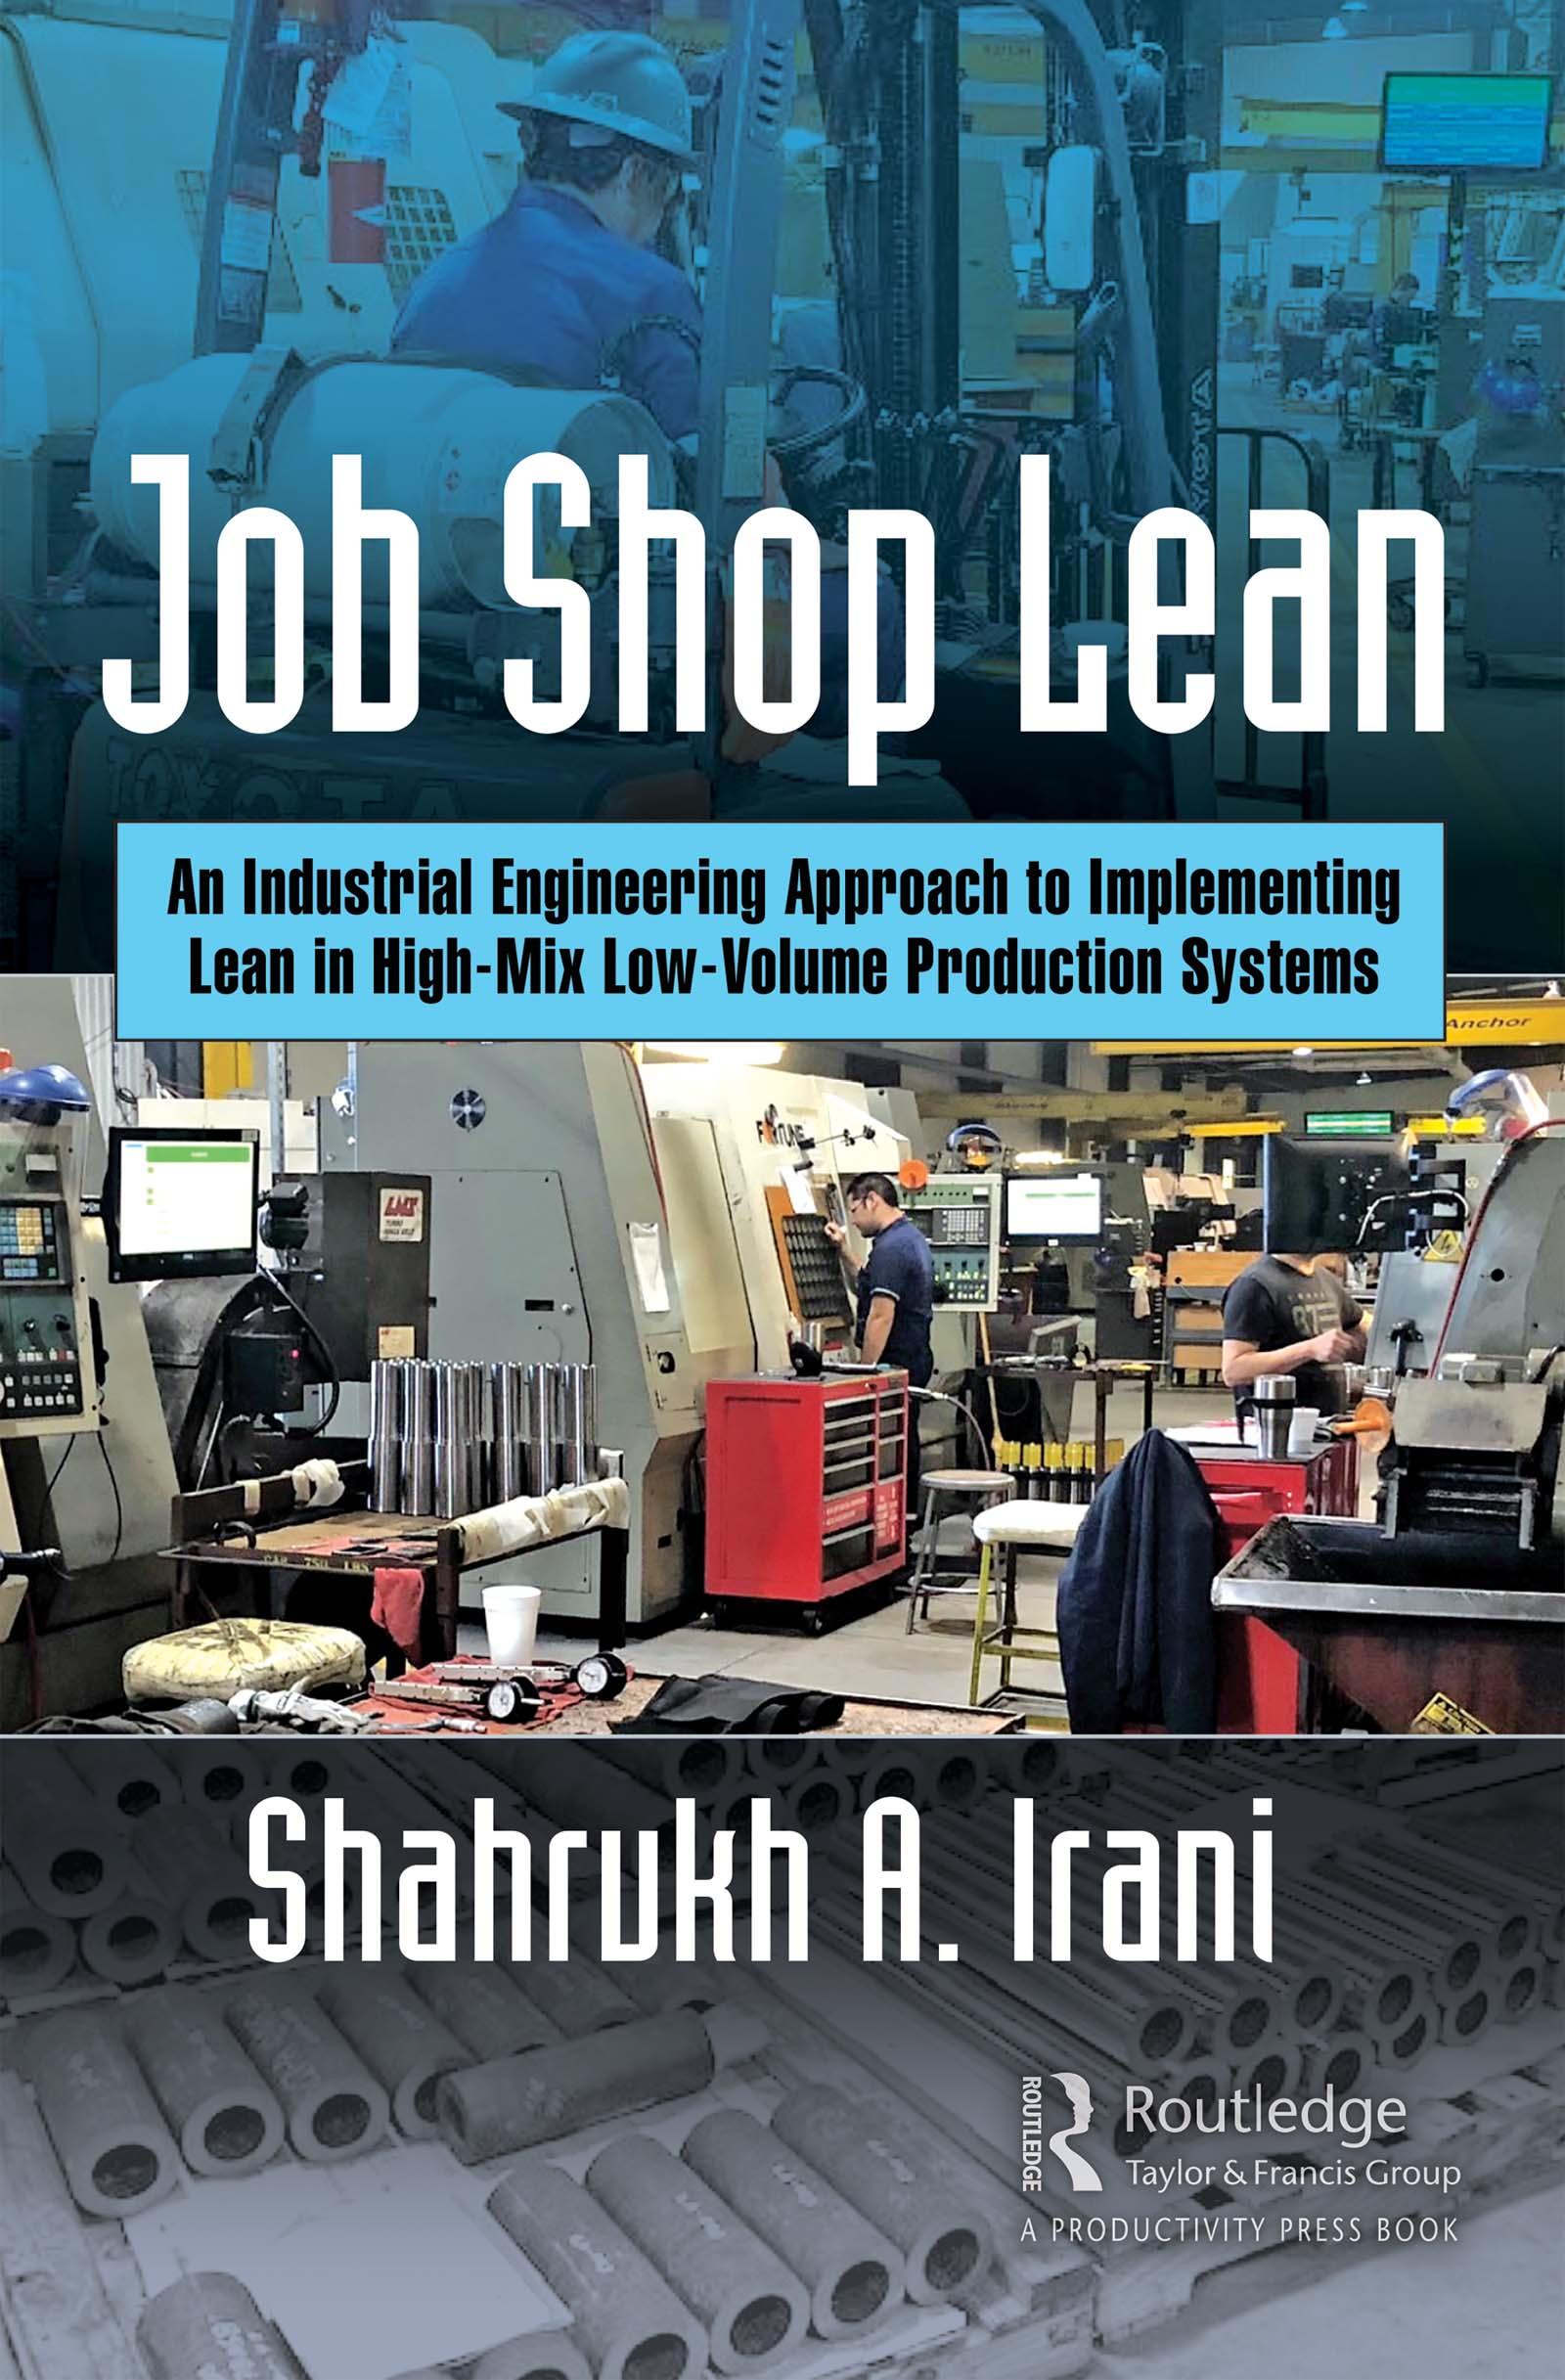 Design For Flow (DFF): The Essential Foundation for Job Shop Lean